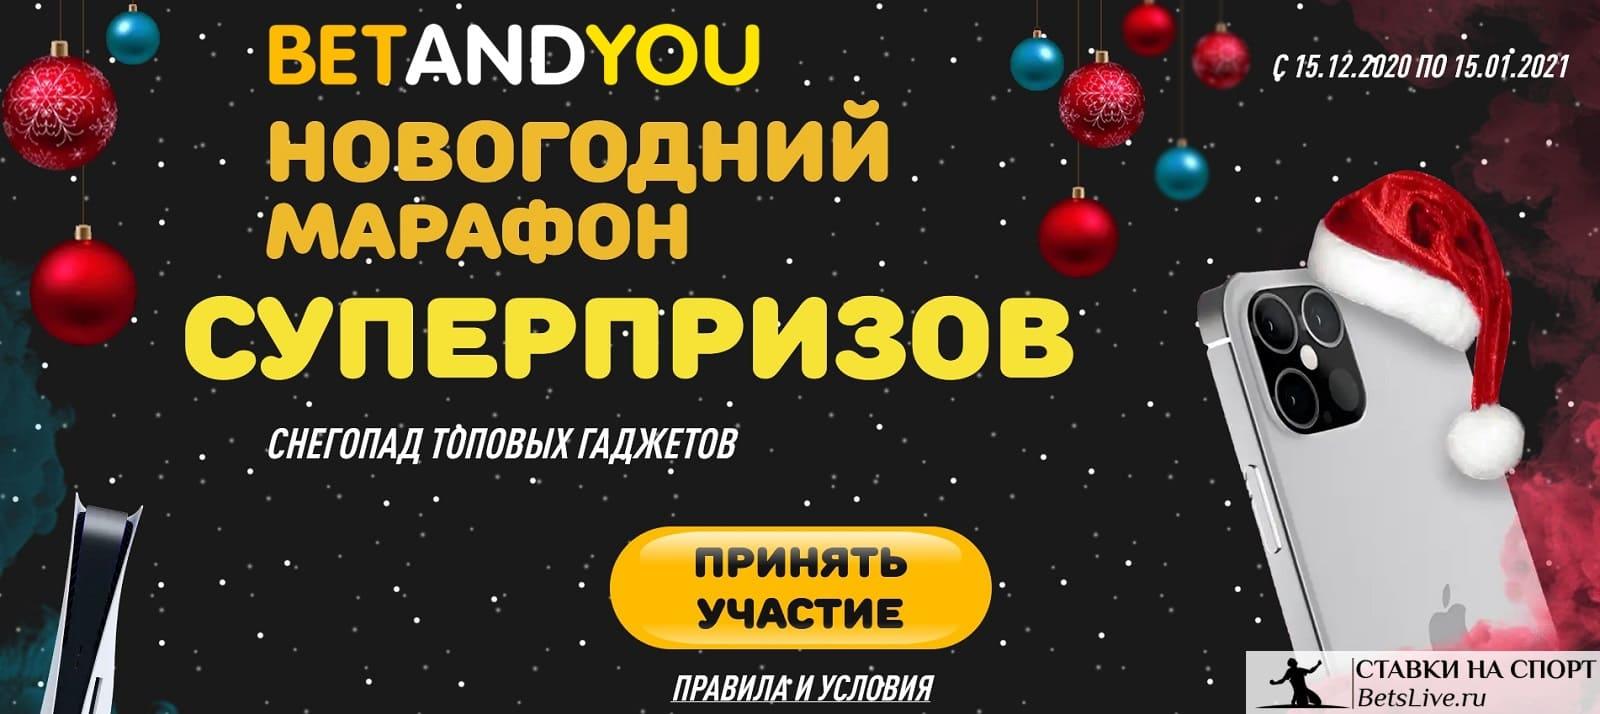 Новогодний марафон от Betandyou